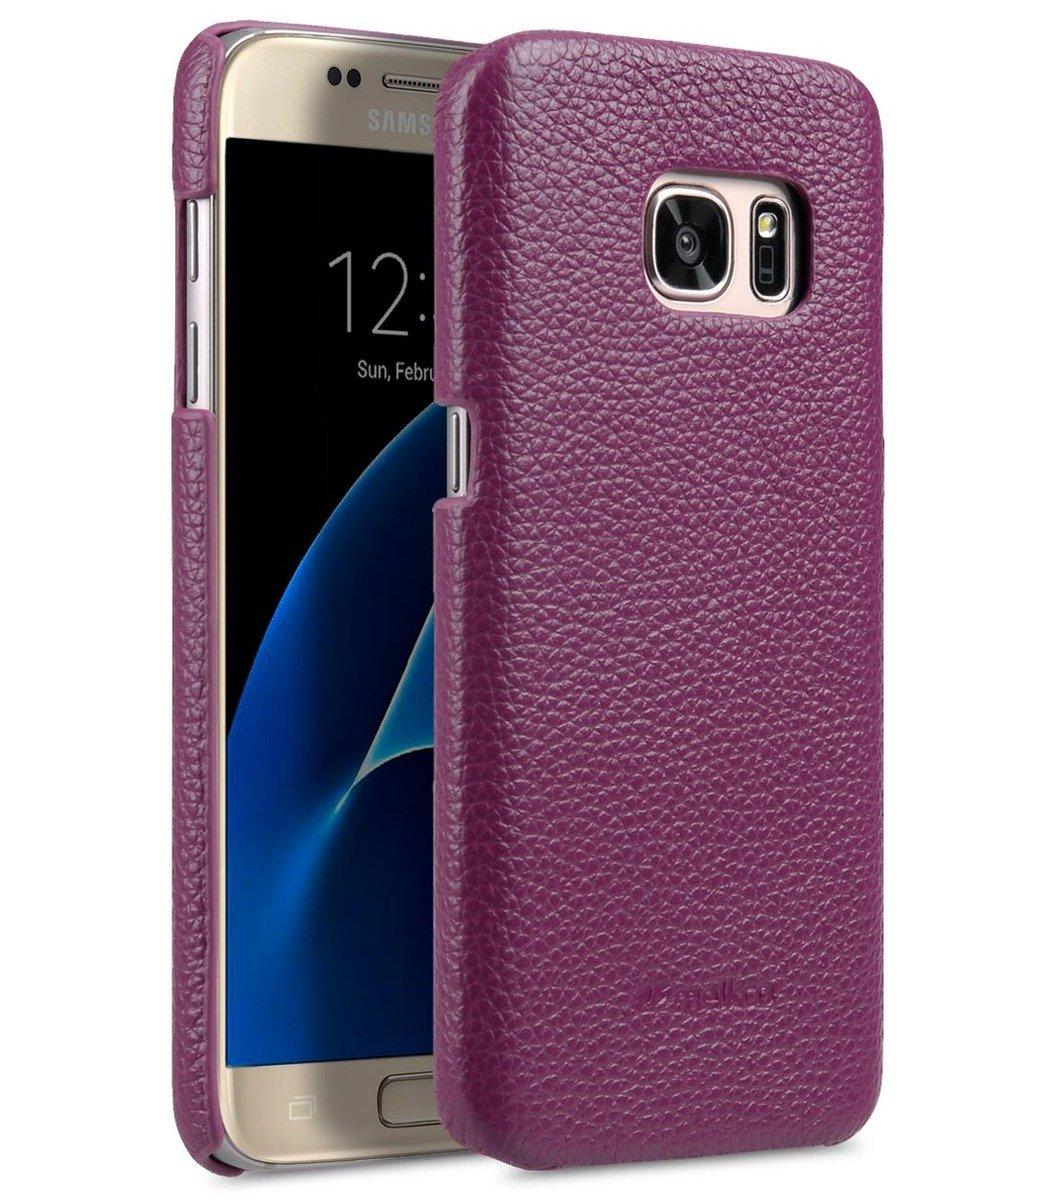 Samsung Galaxy S7 荔枝紋真皮背殼 (紫色)